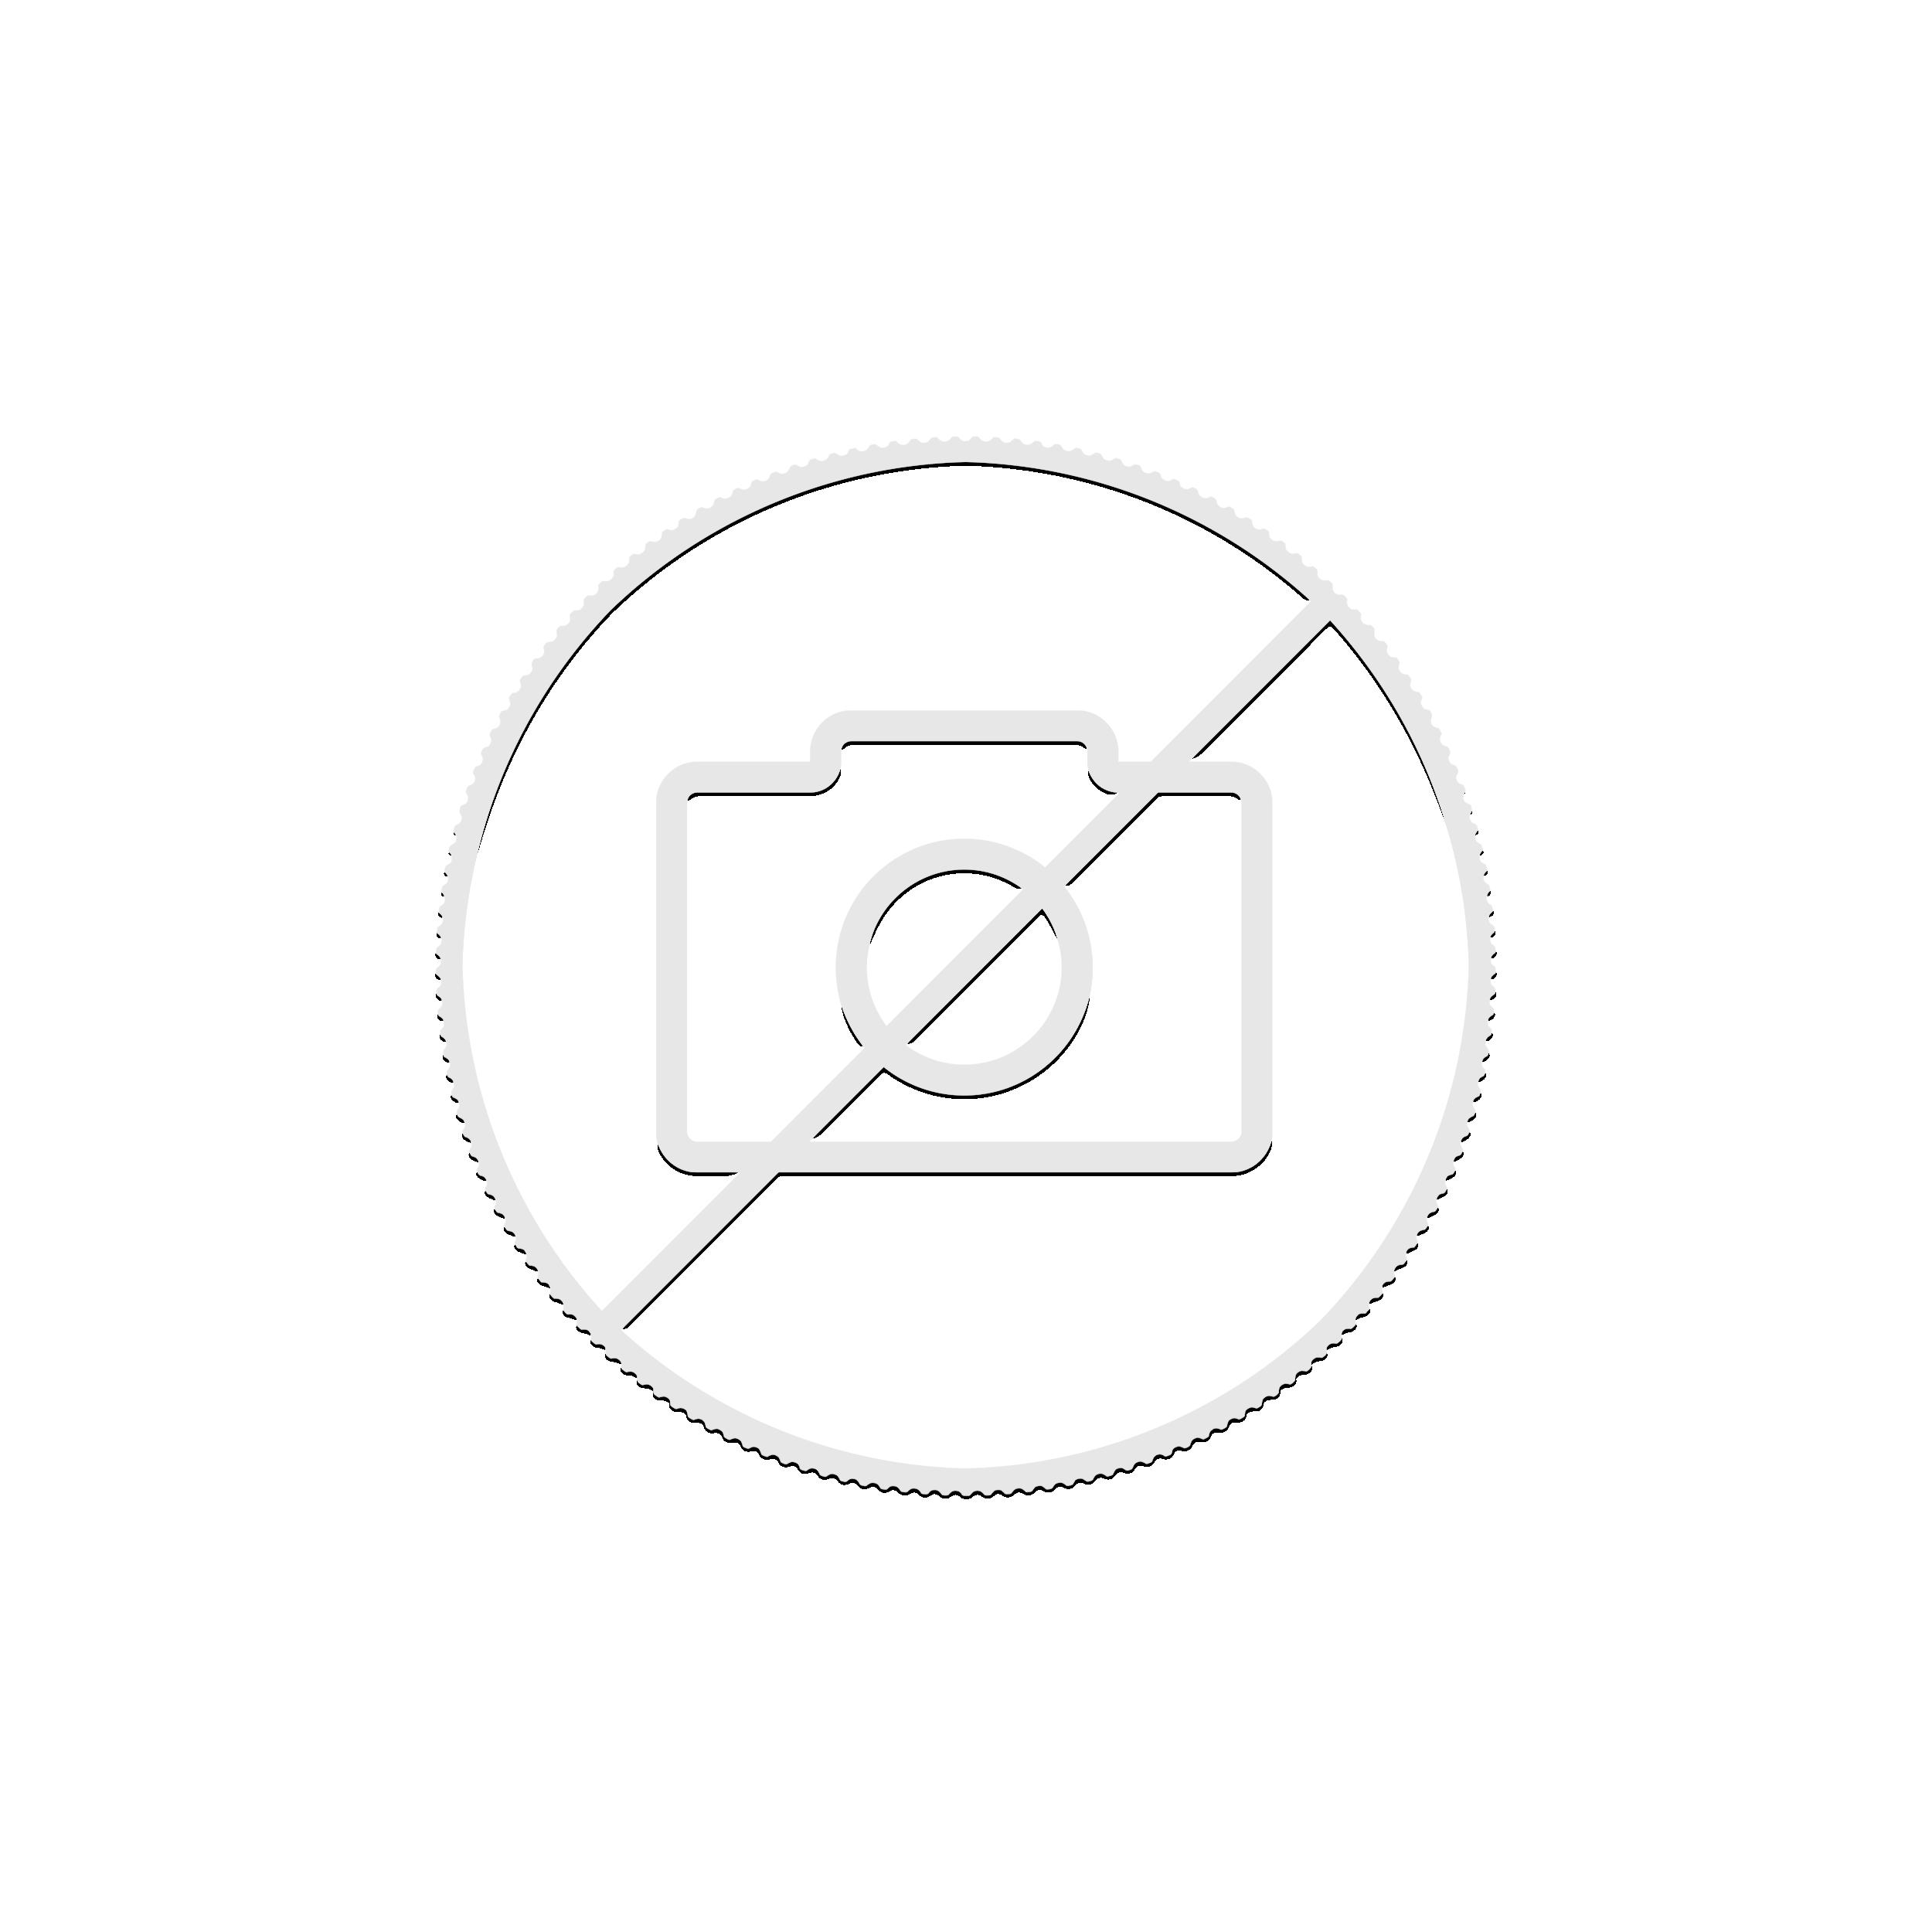 1/10 Troy ounce silver coin Mexican Libertad 2019